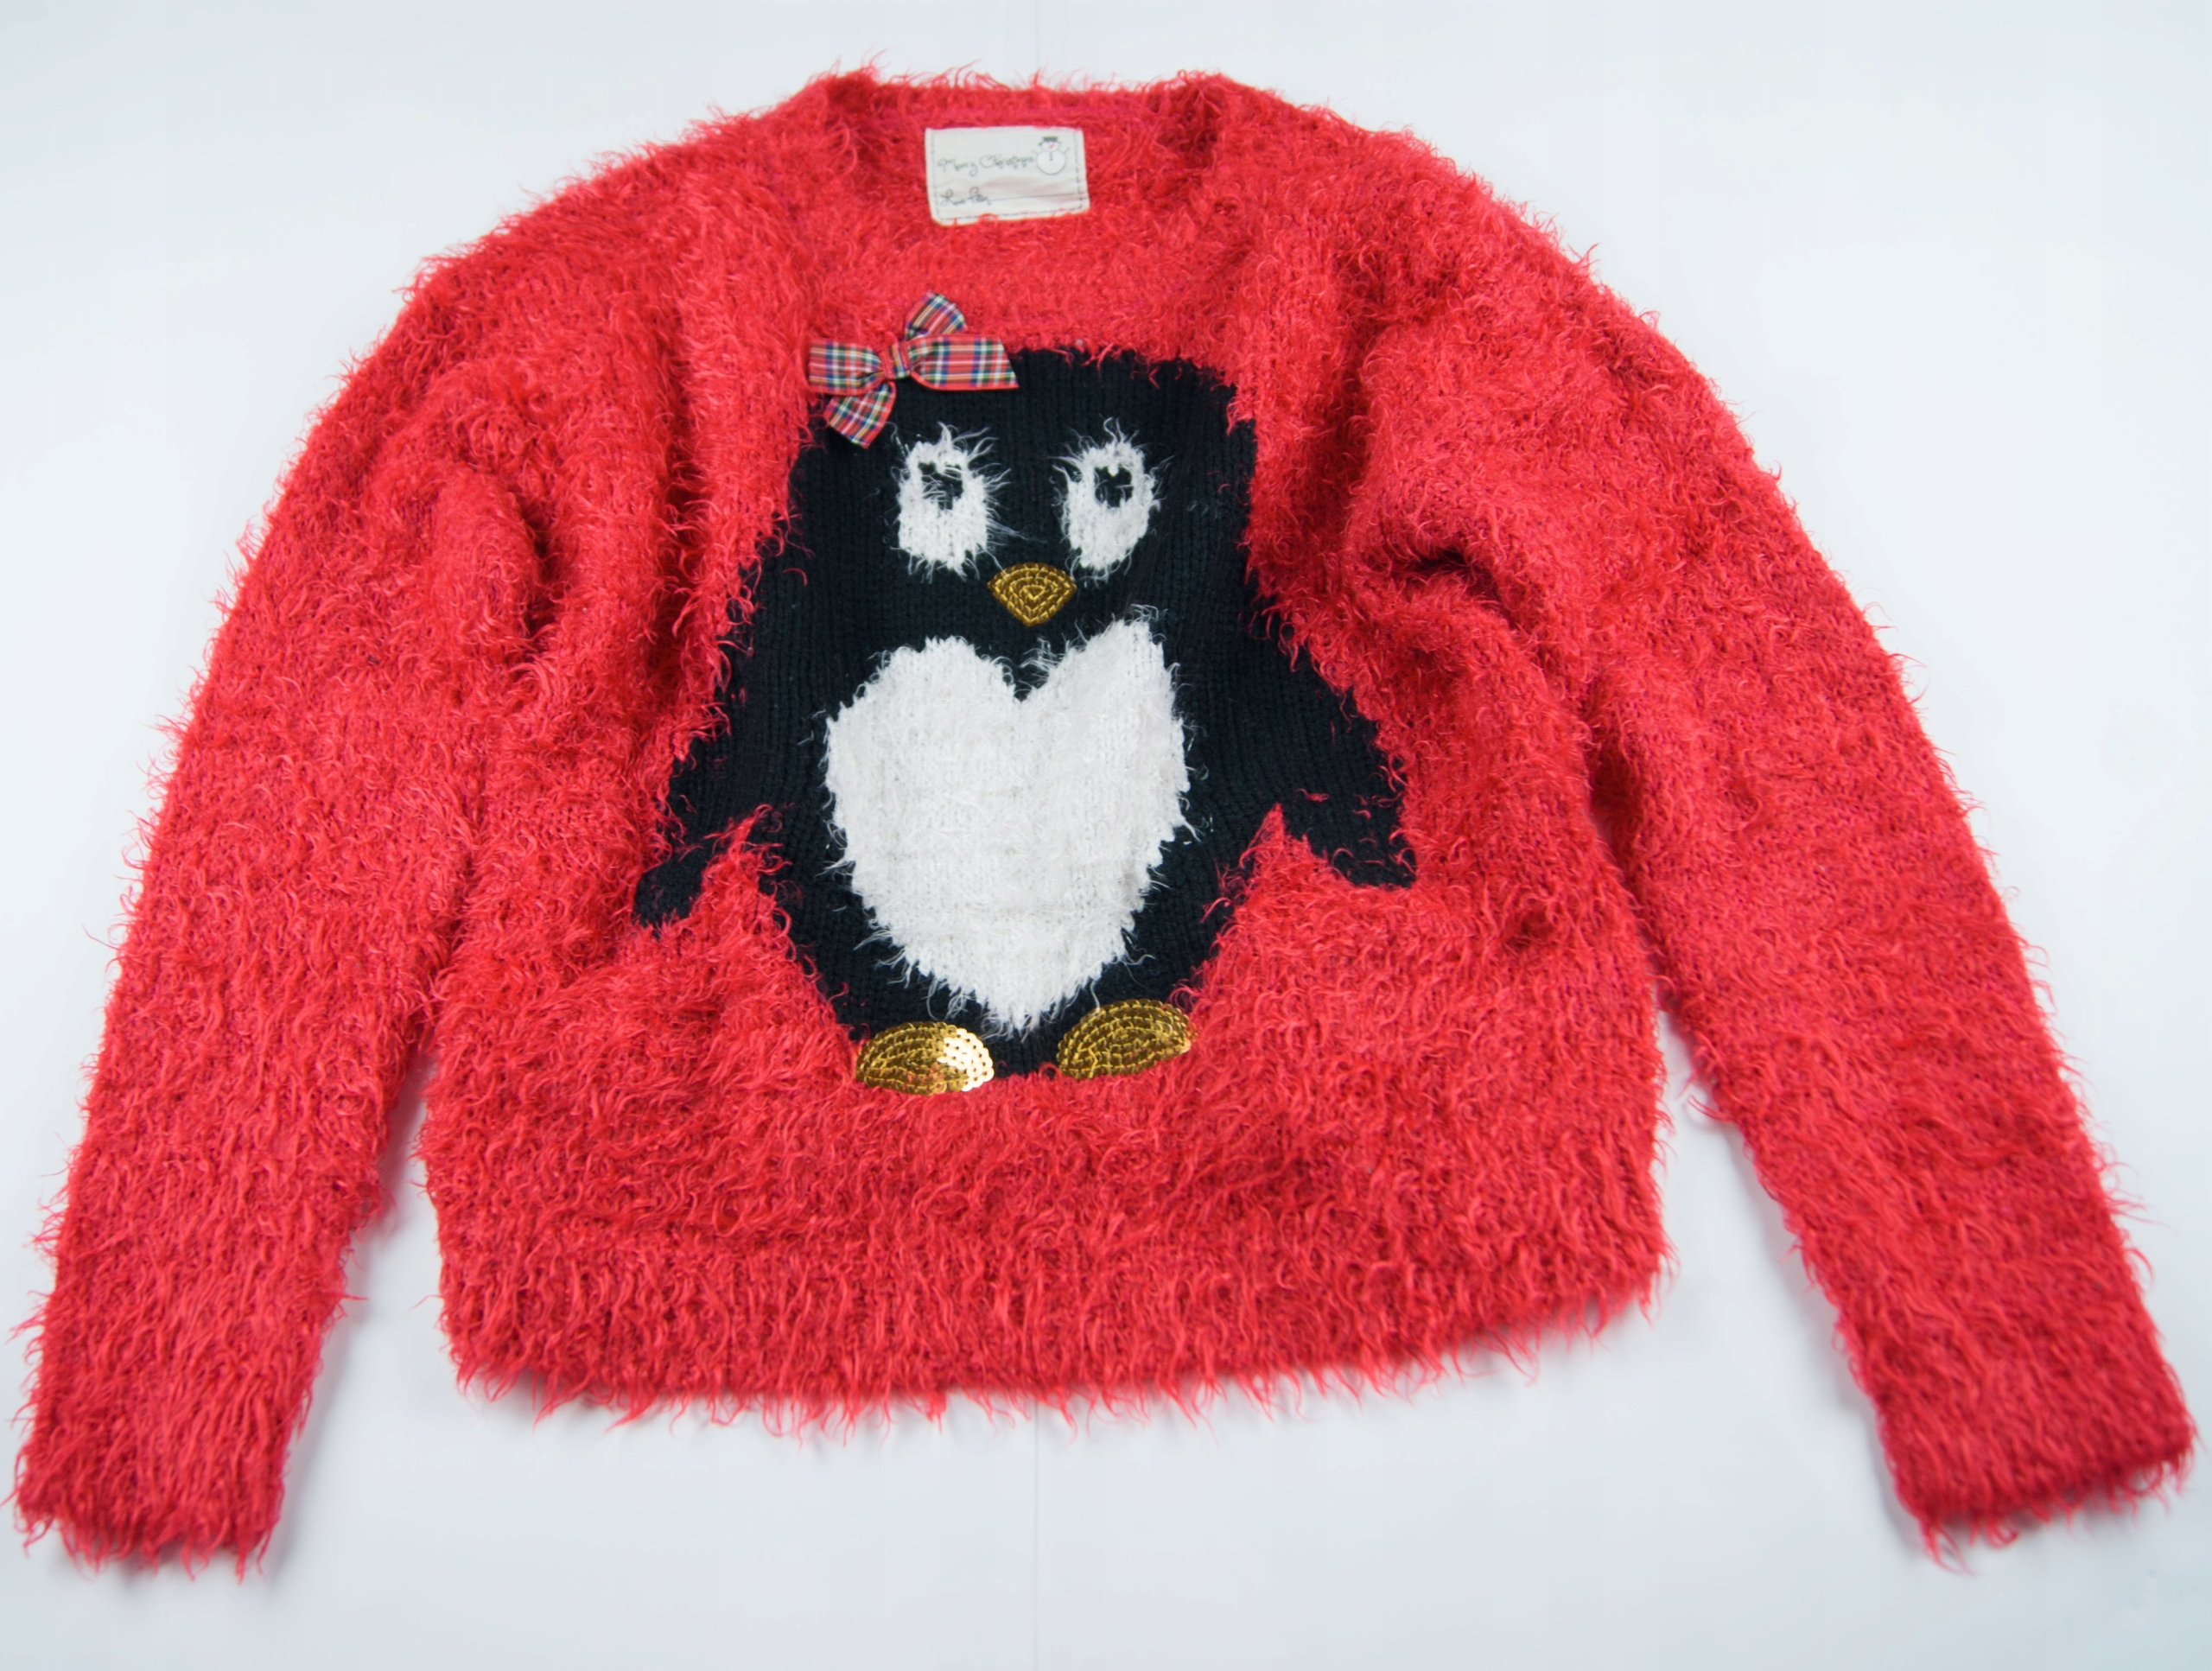 ST BERNARD 140 Włochaty sweterek z pingwinem 10lat